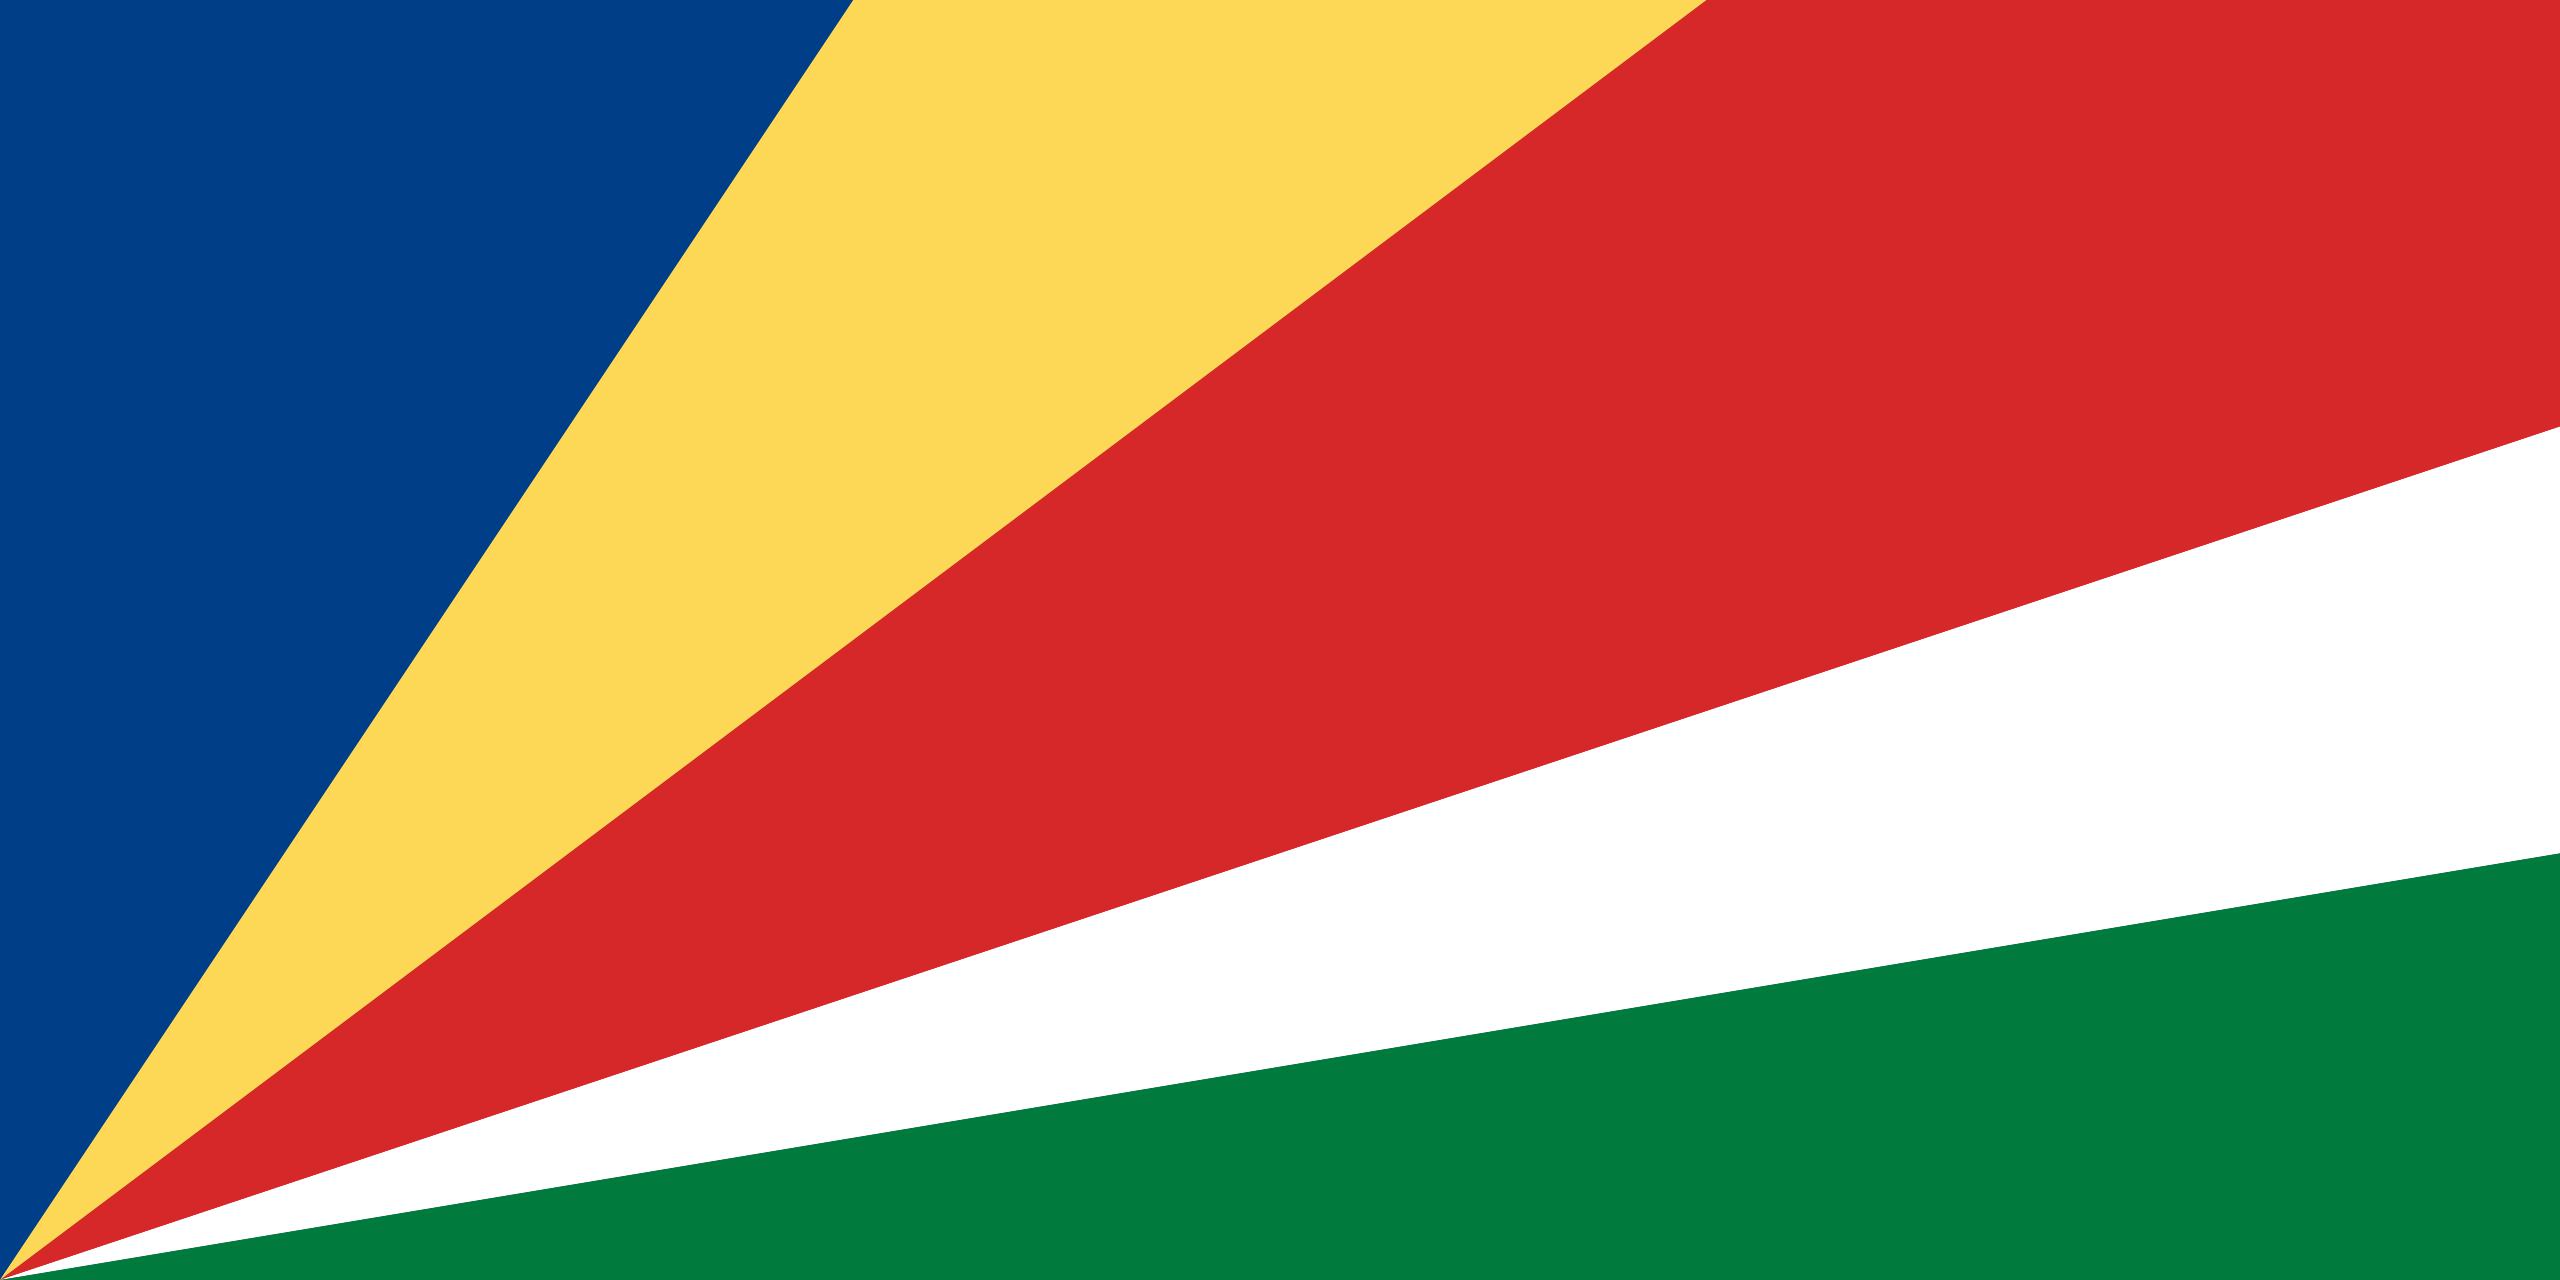 seychelles, 国家, 会徽, 徽标, 符号 - 高清壁纸 - 教授-falken.com